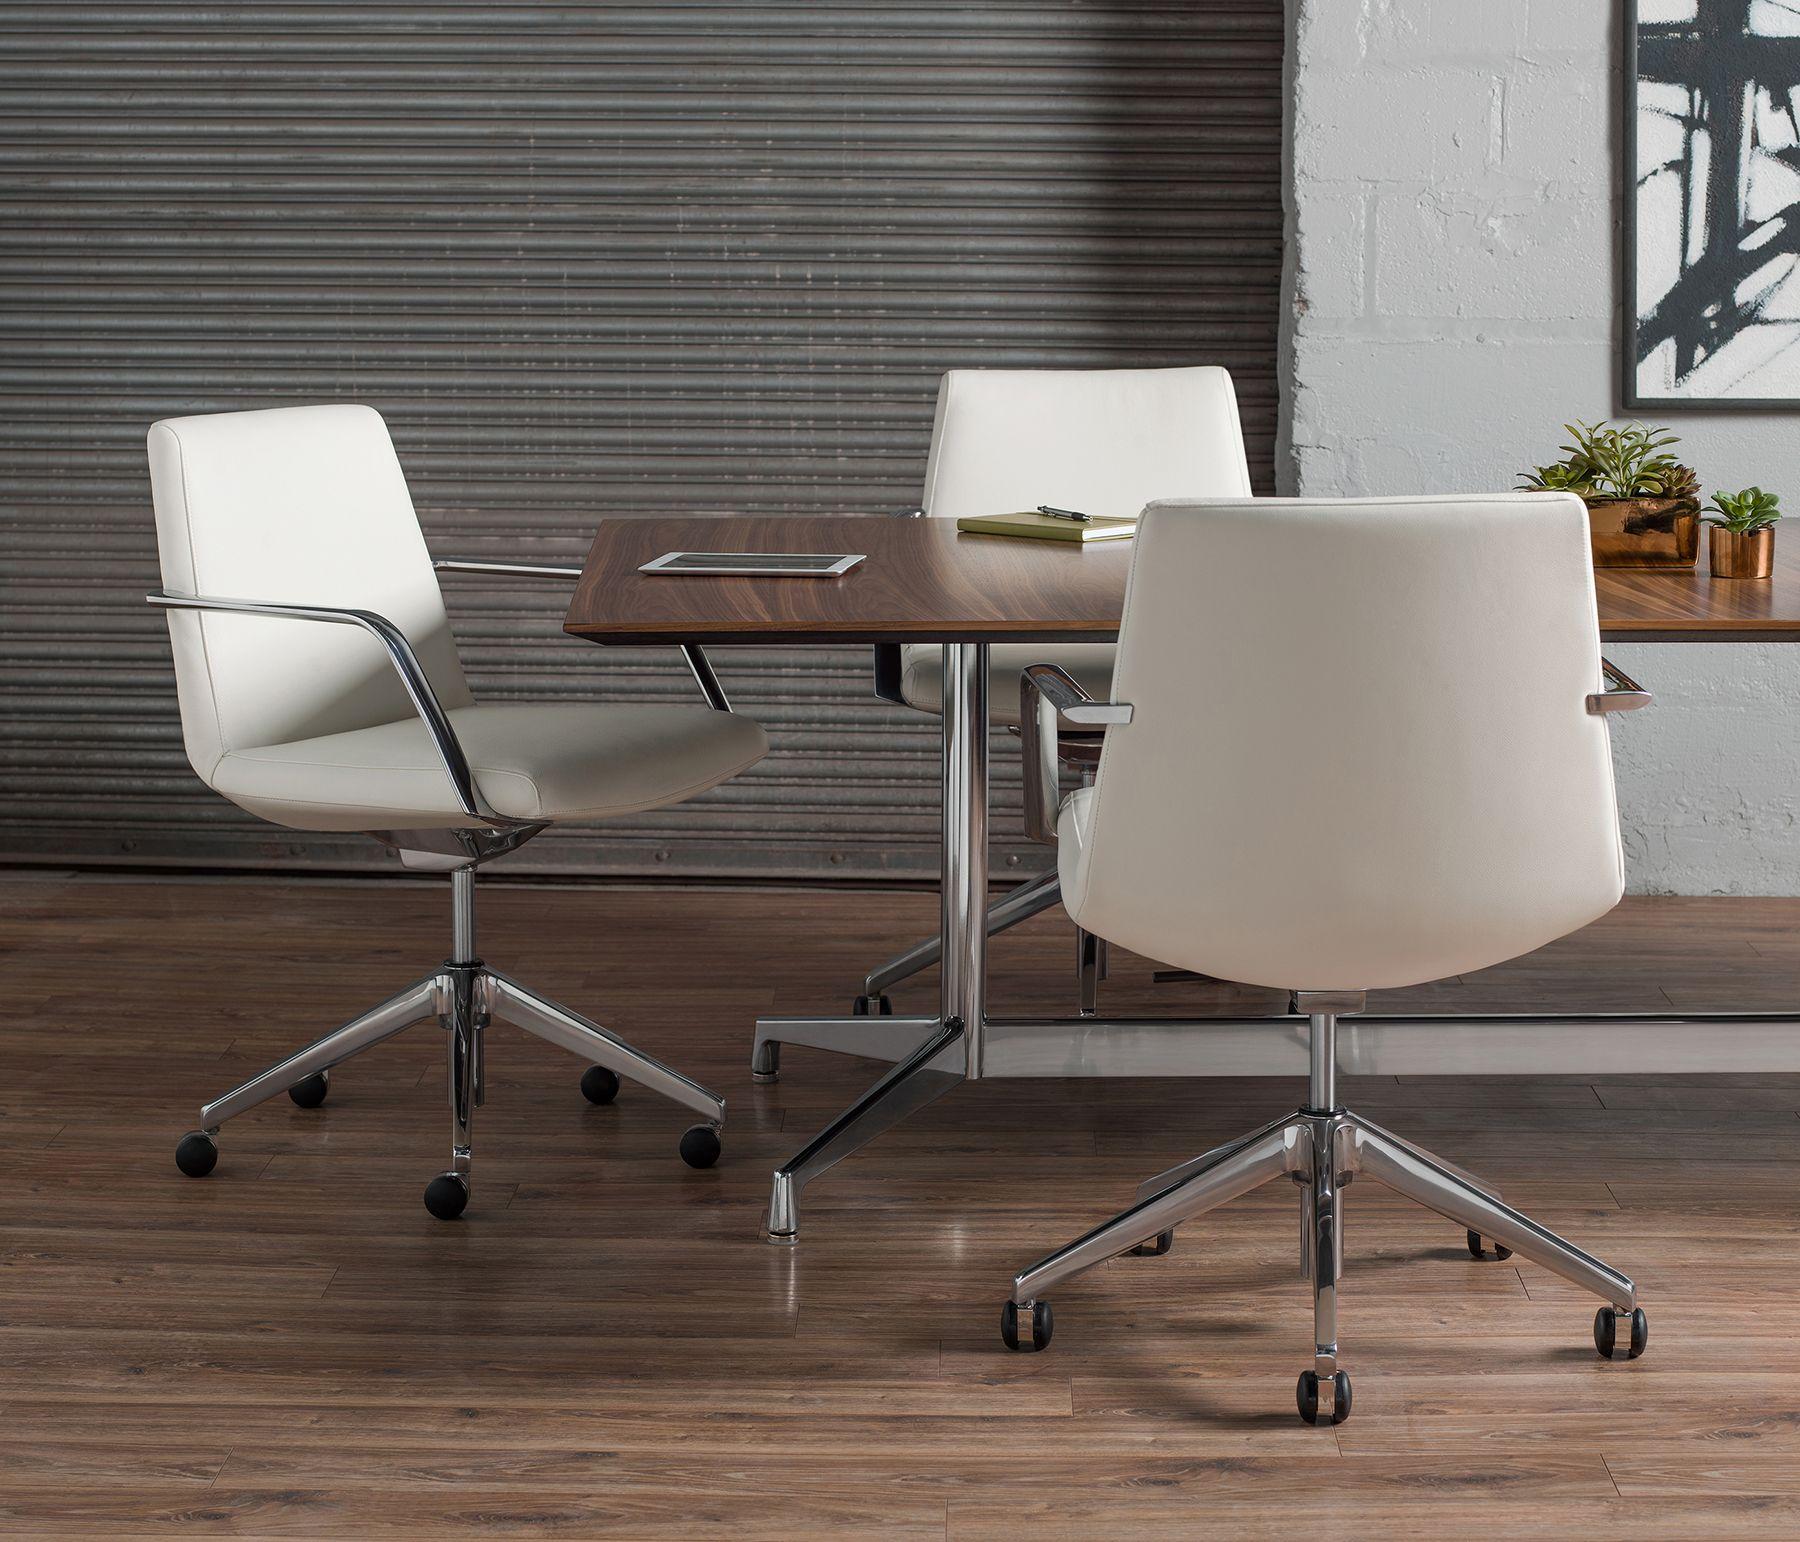 Furniture, Minimalist Home Decor